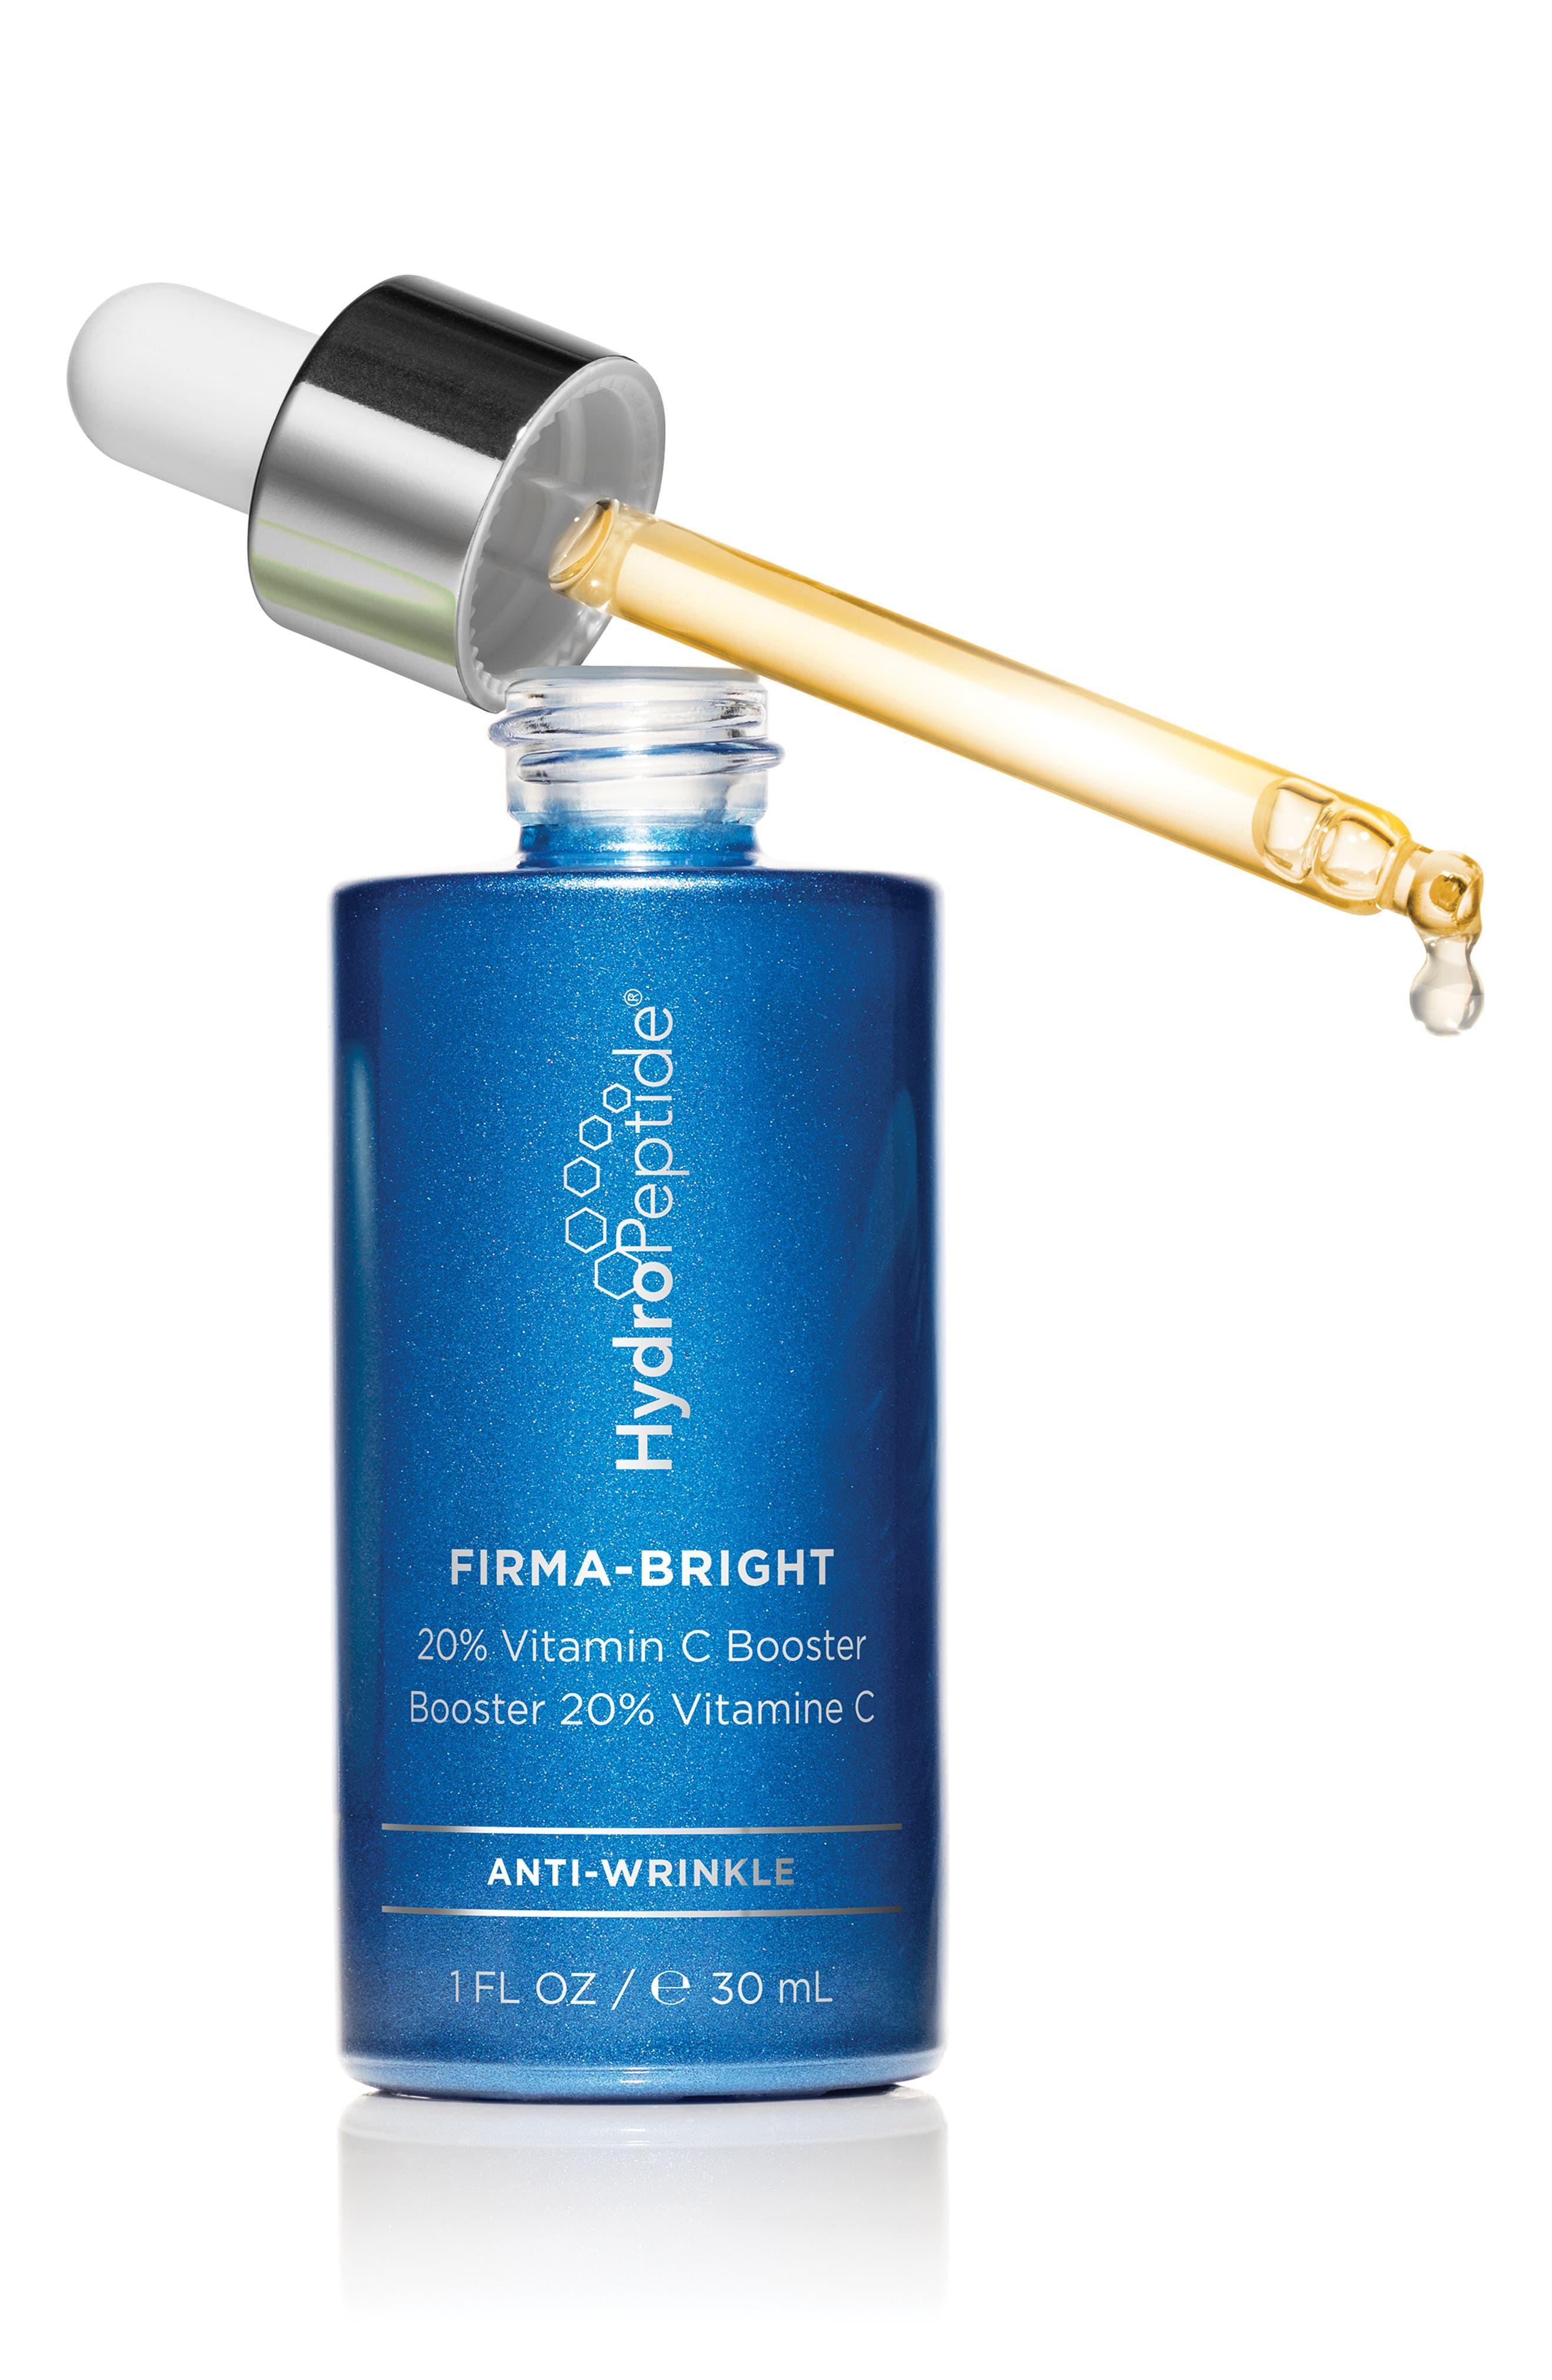 Firma-Bright 20% Vitamin C Booster